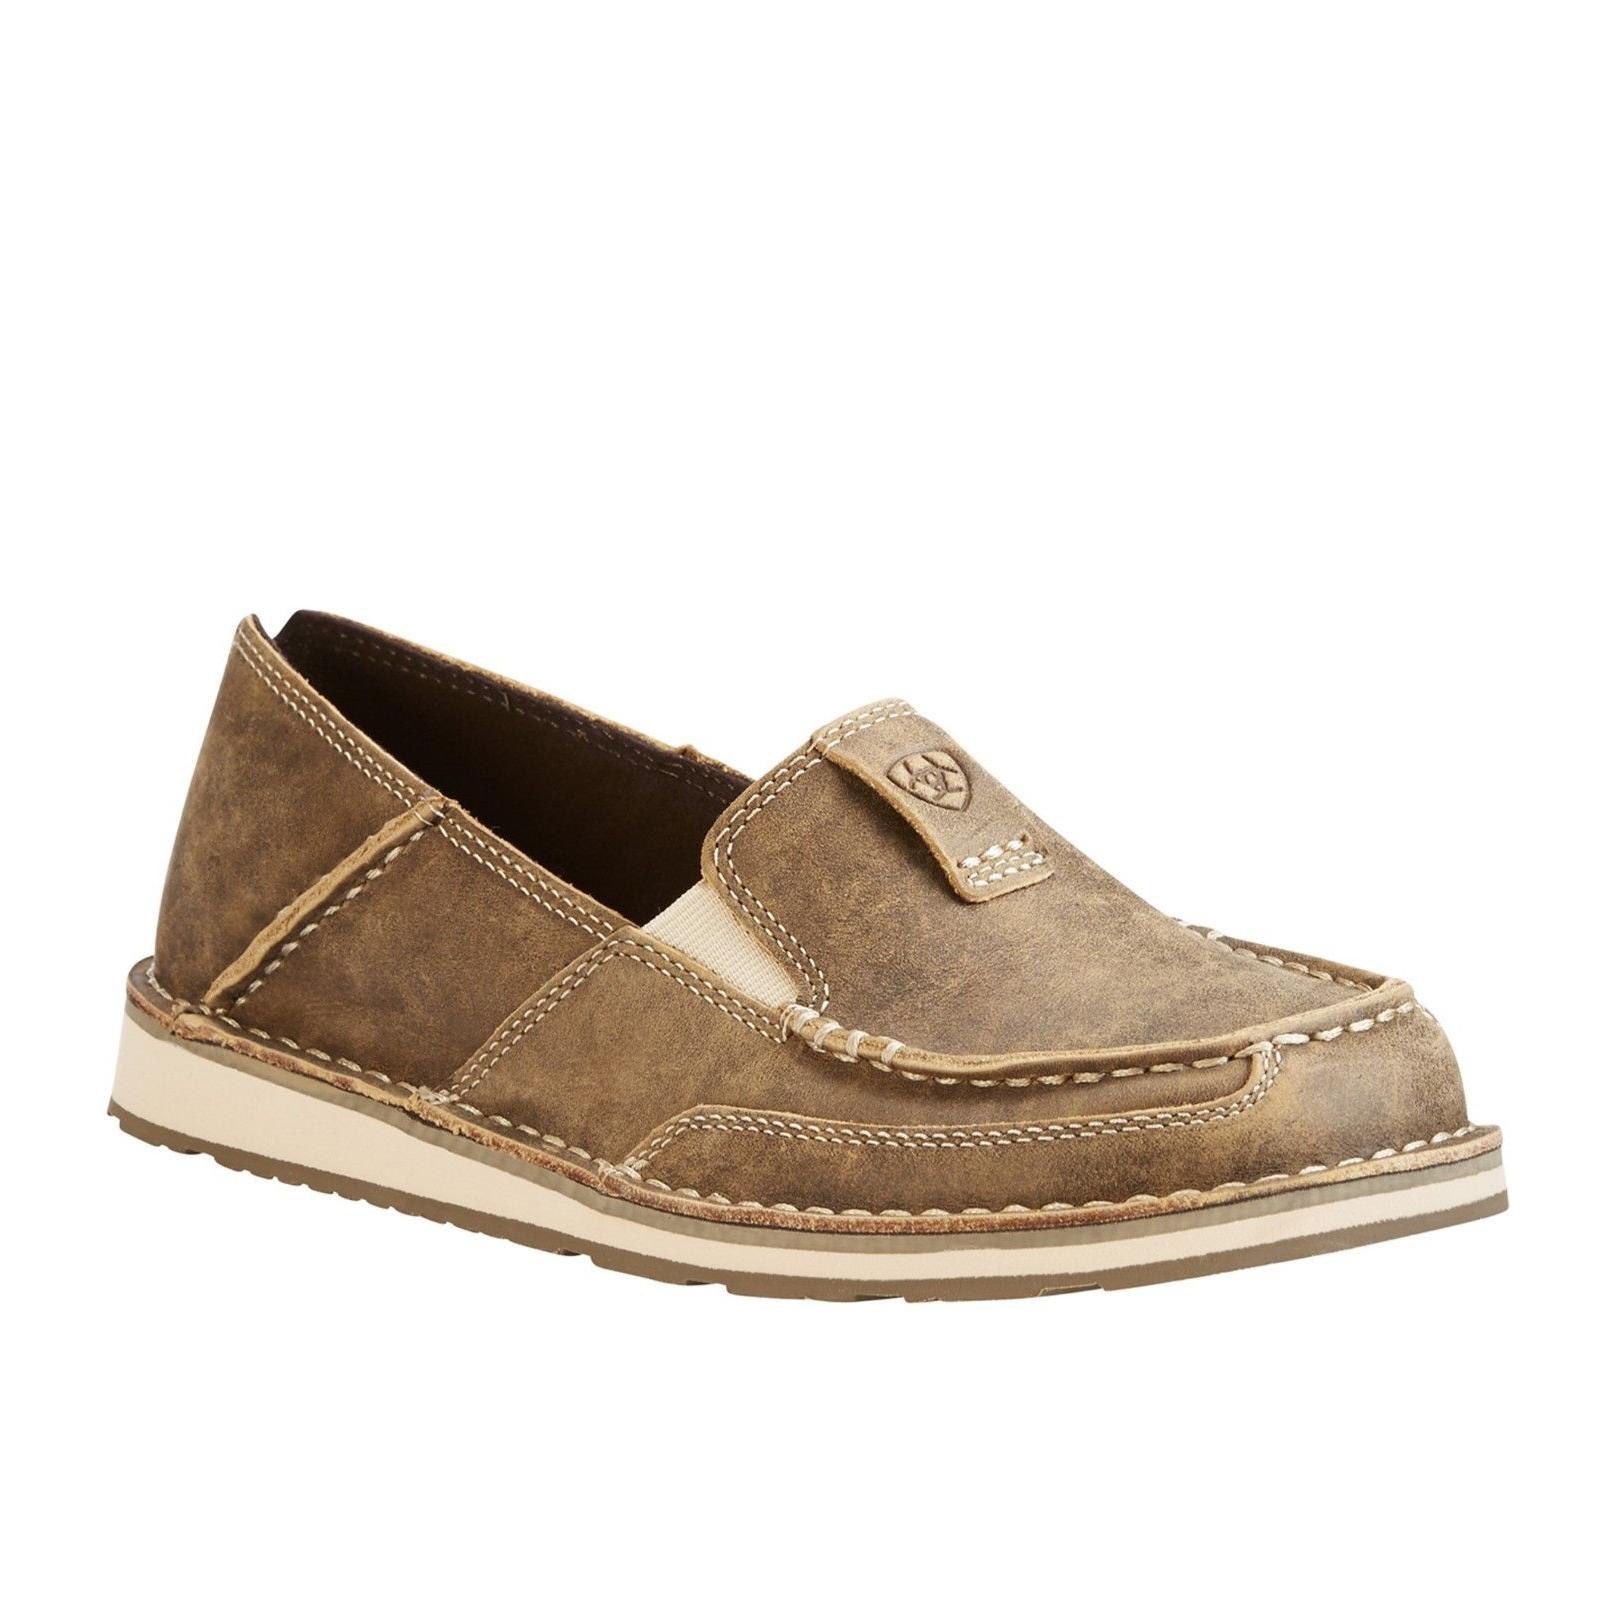 Ariat® Ladies Cruiser Bomber Brown shoes 10023008